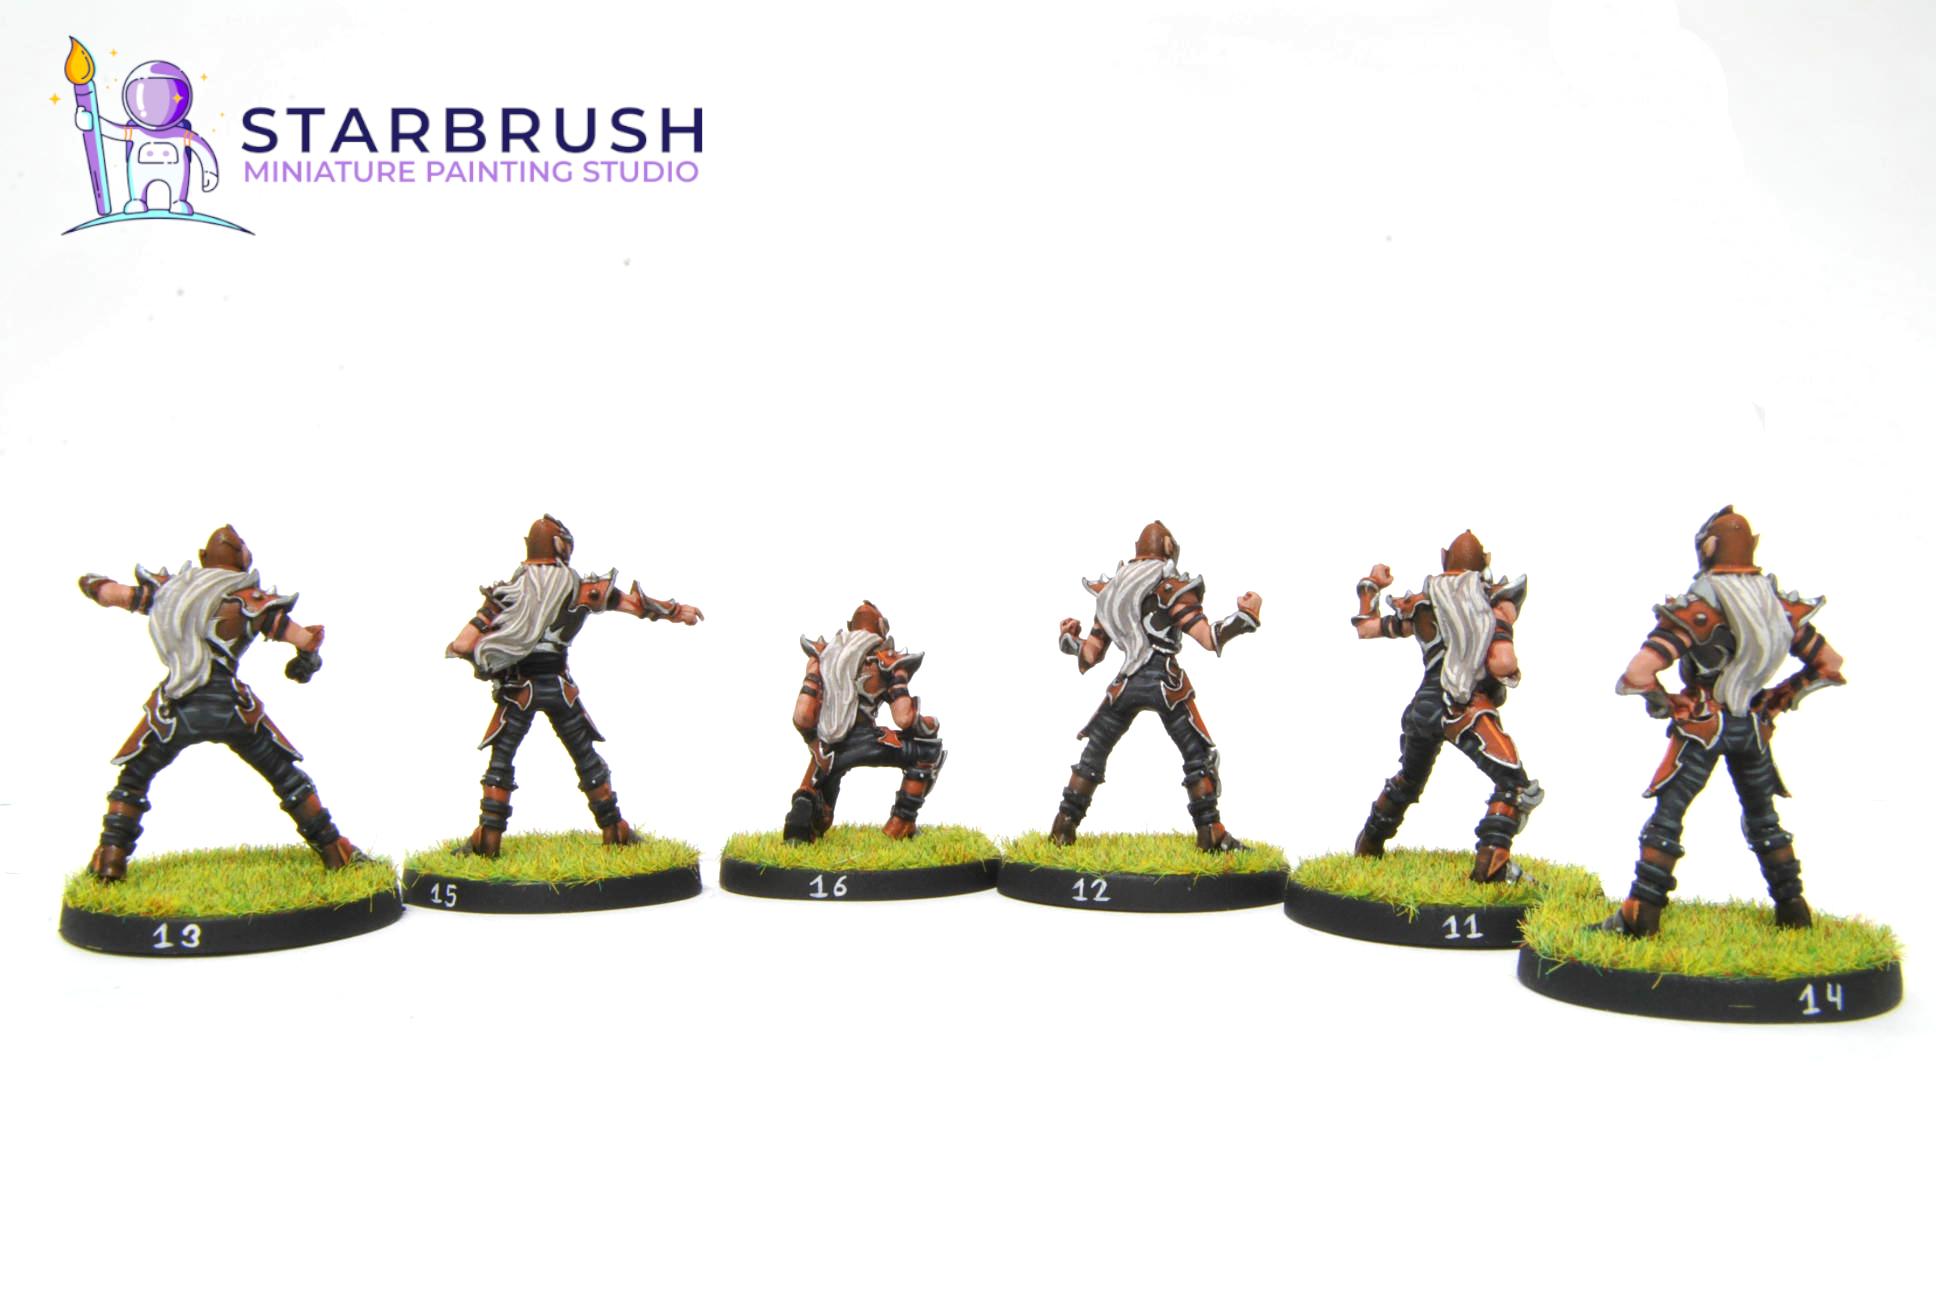 Equipo Obsidian Dust. Greebo Miniatures. Nivel 3